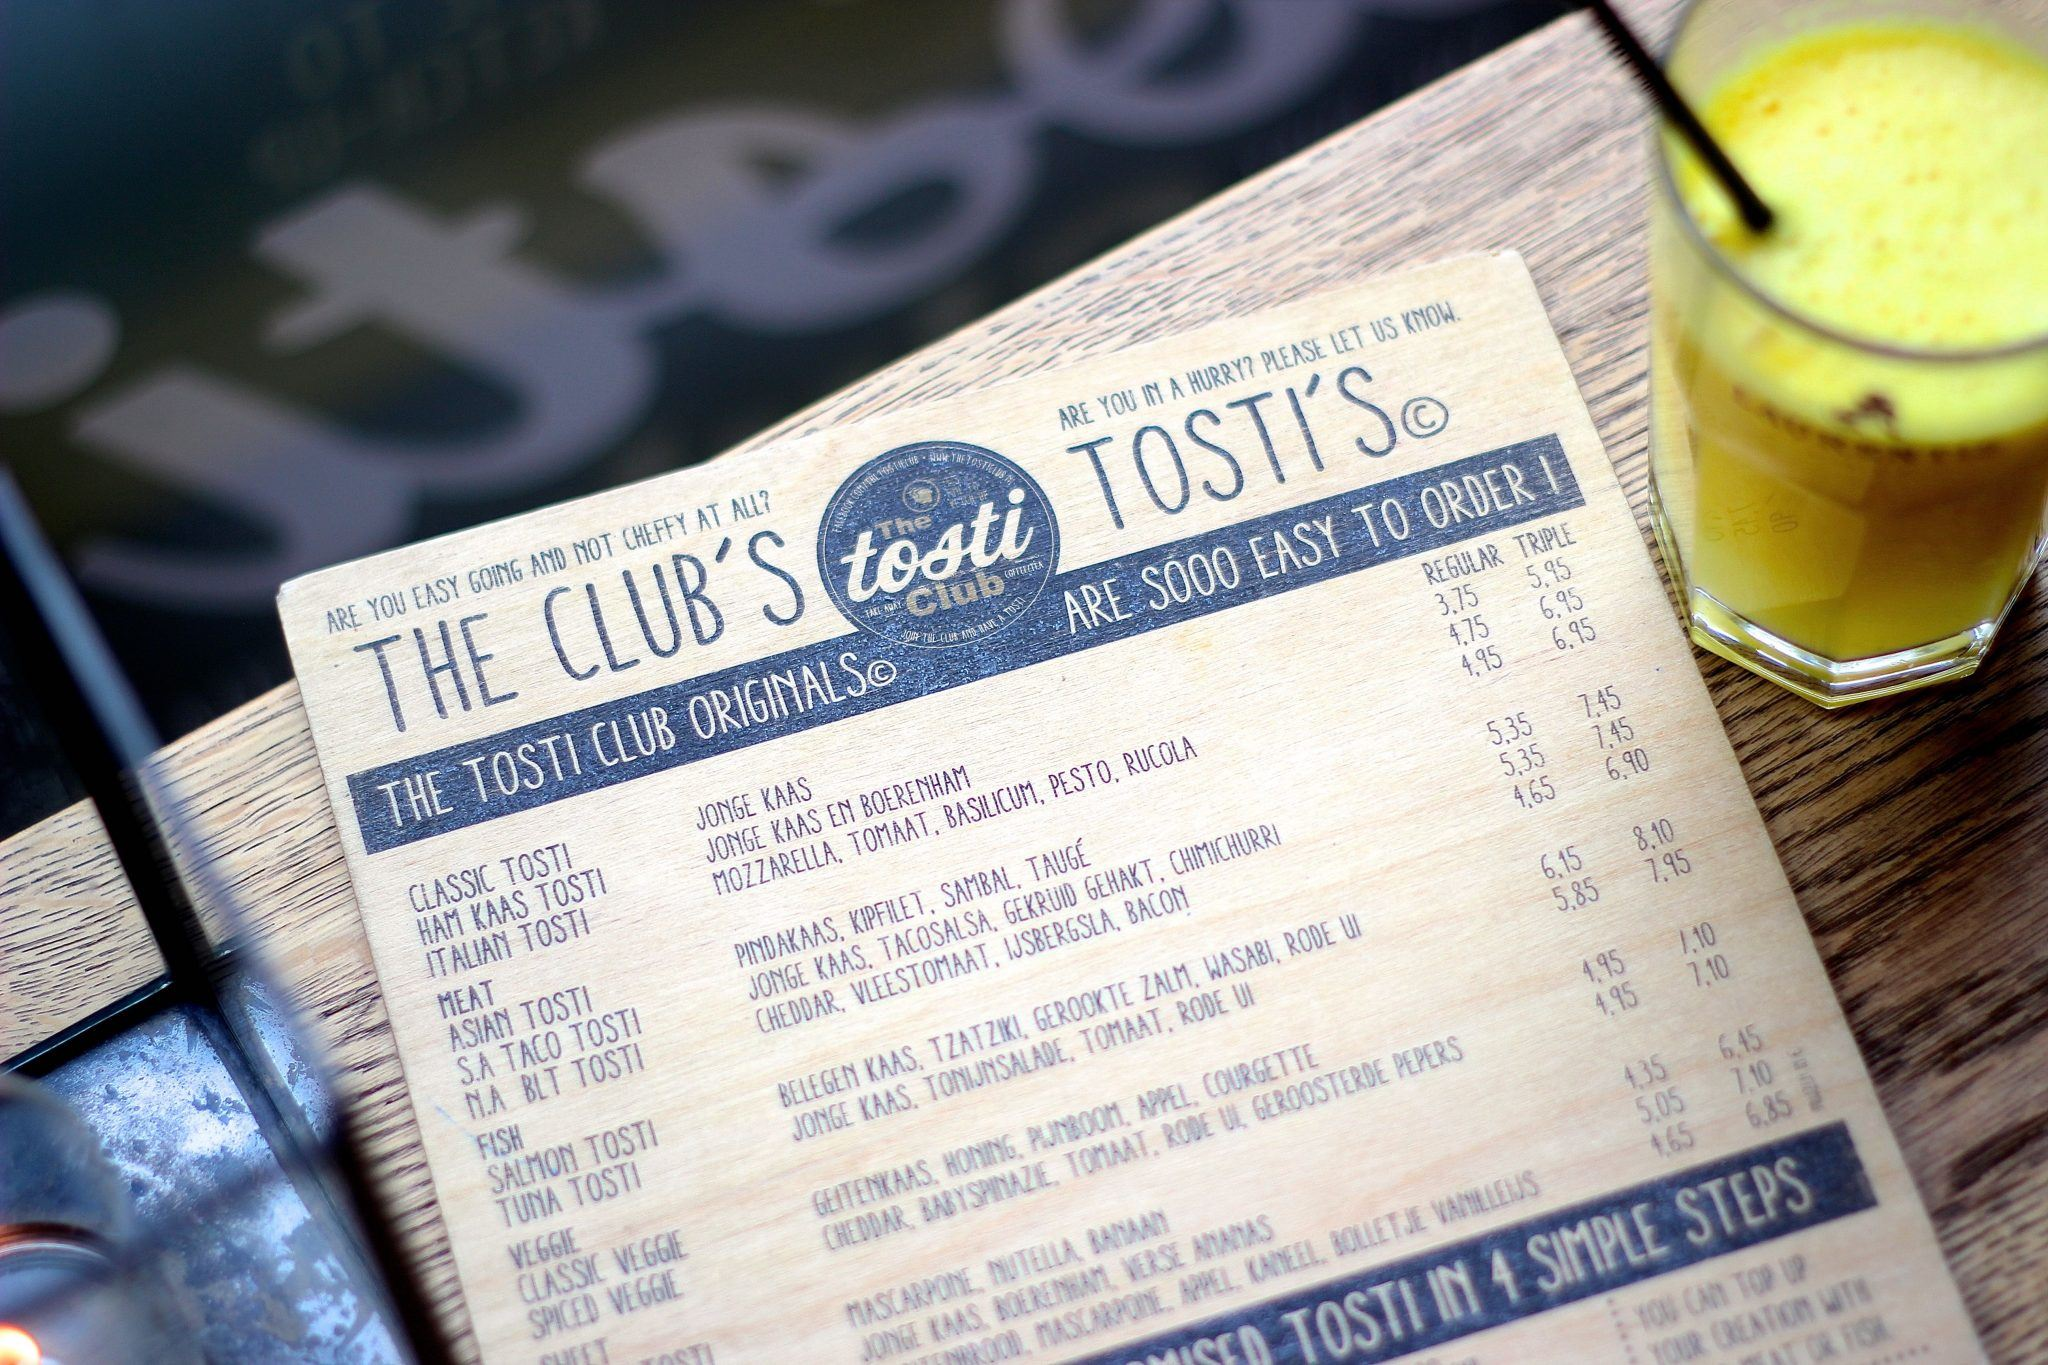 The Tosti Club Menu